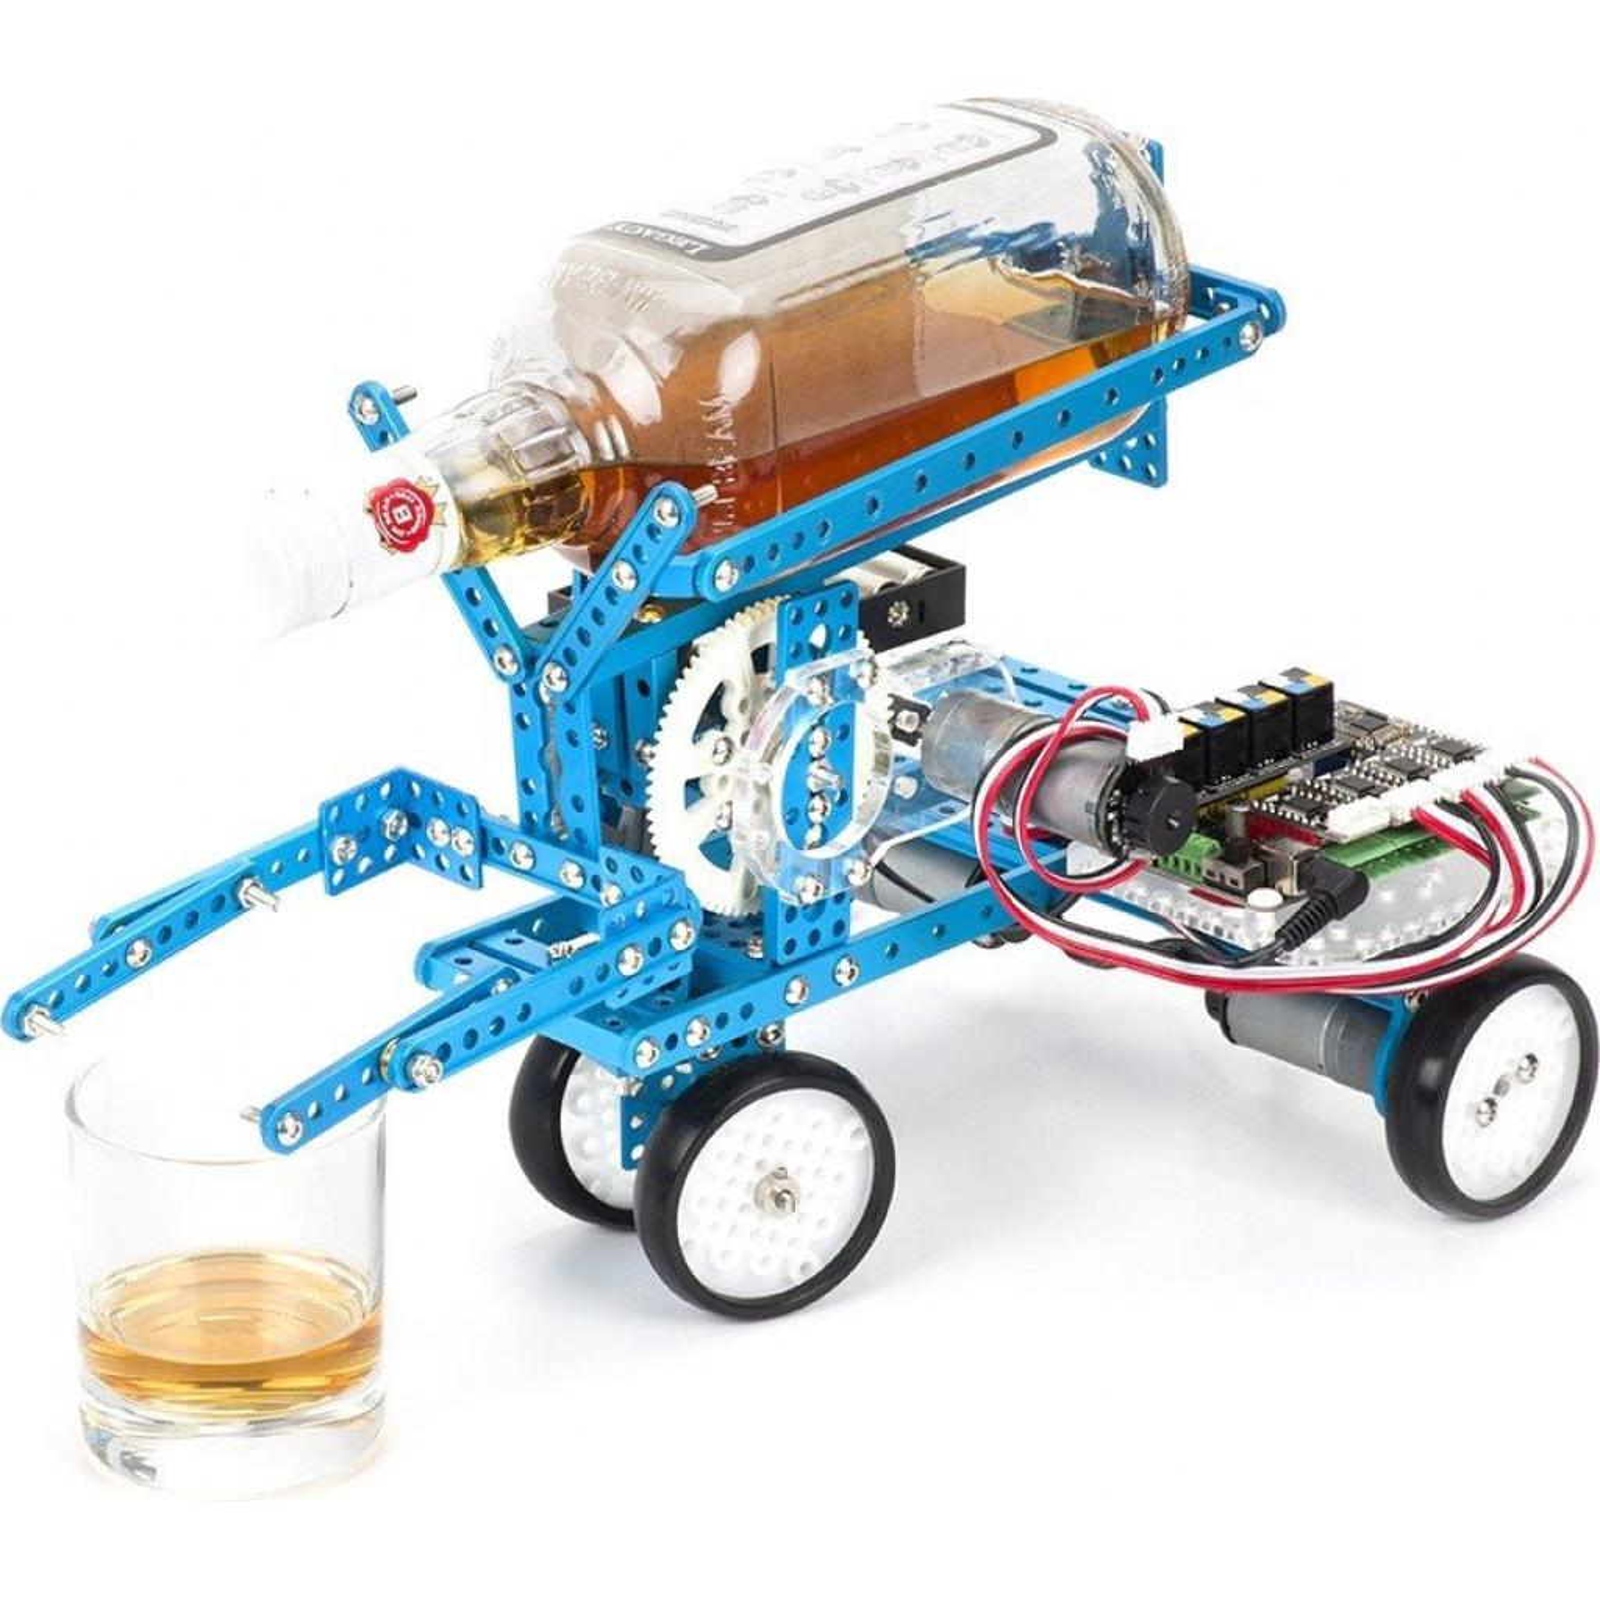 Робот Makeblock Ultimate v2.0 Robot Kit (09.00.40) изображение 8